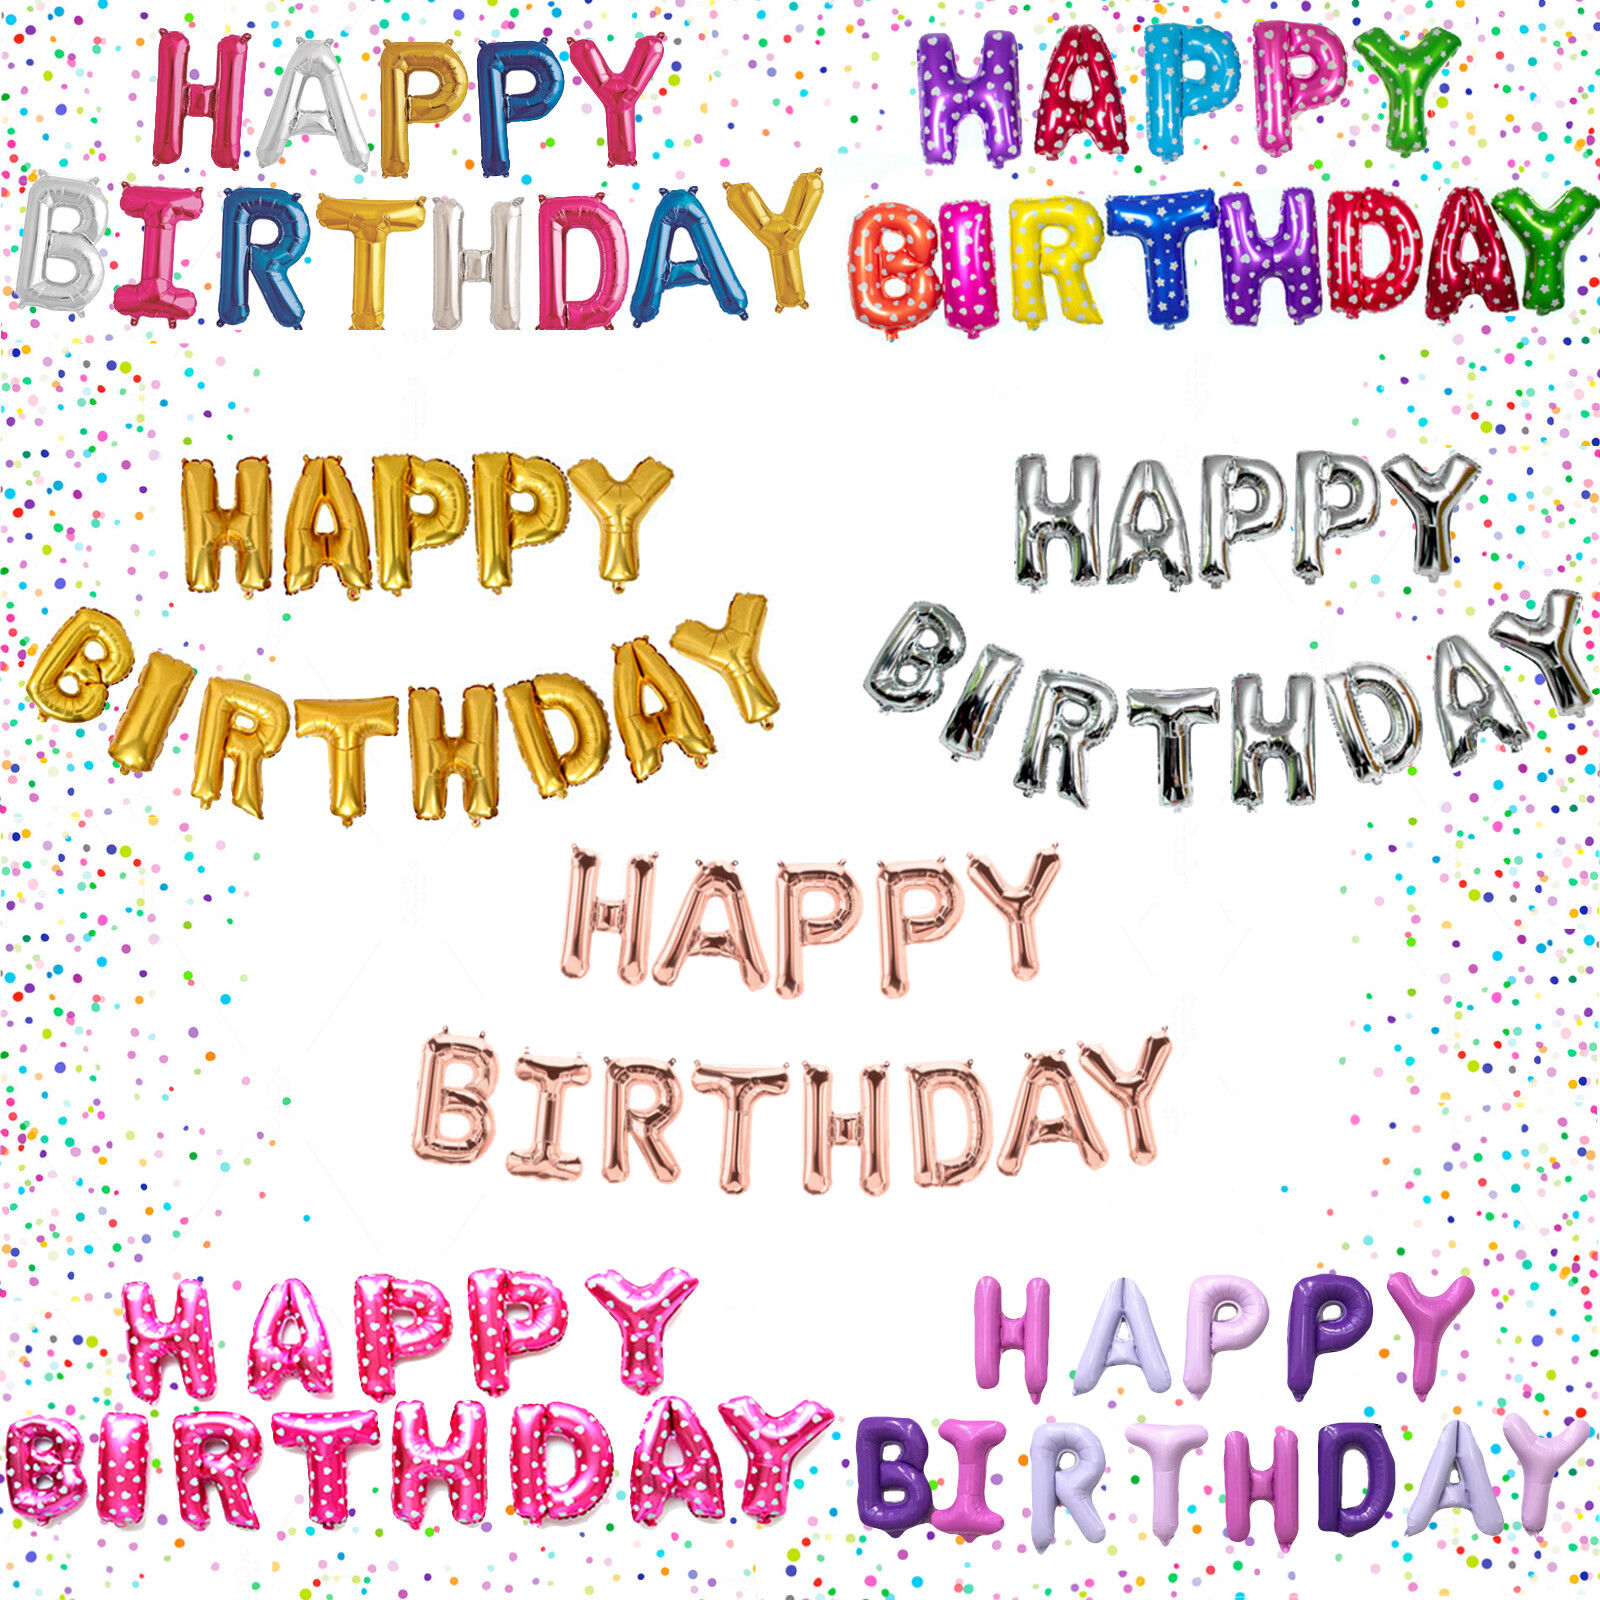 13 tlg Happy Birthday Folienballons Luftballons Buchstaben ...